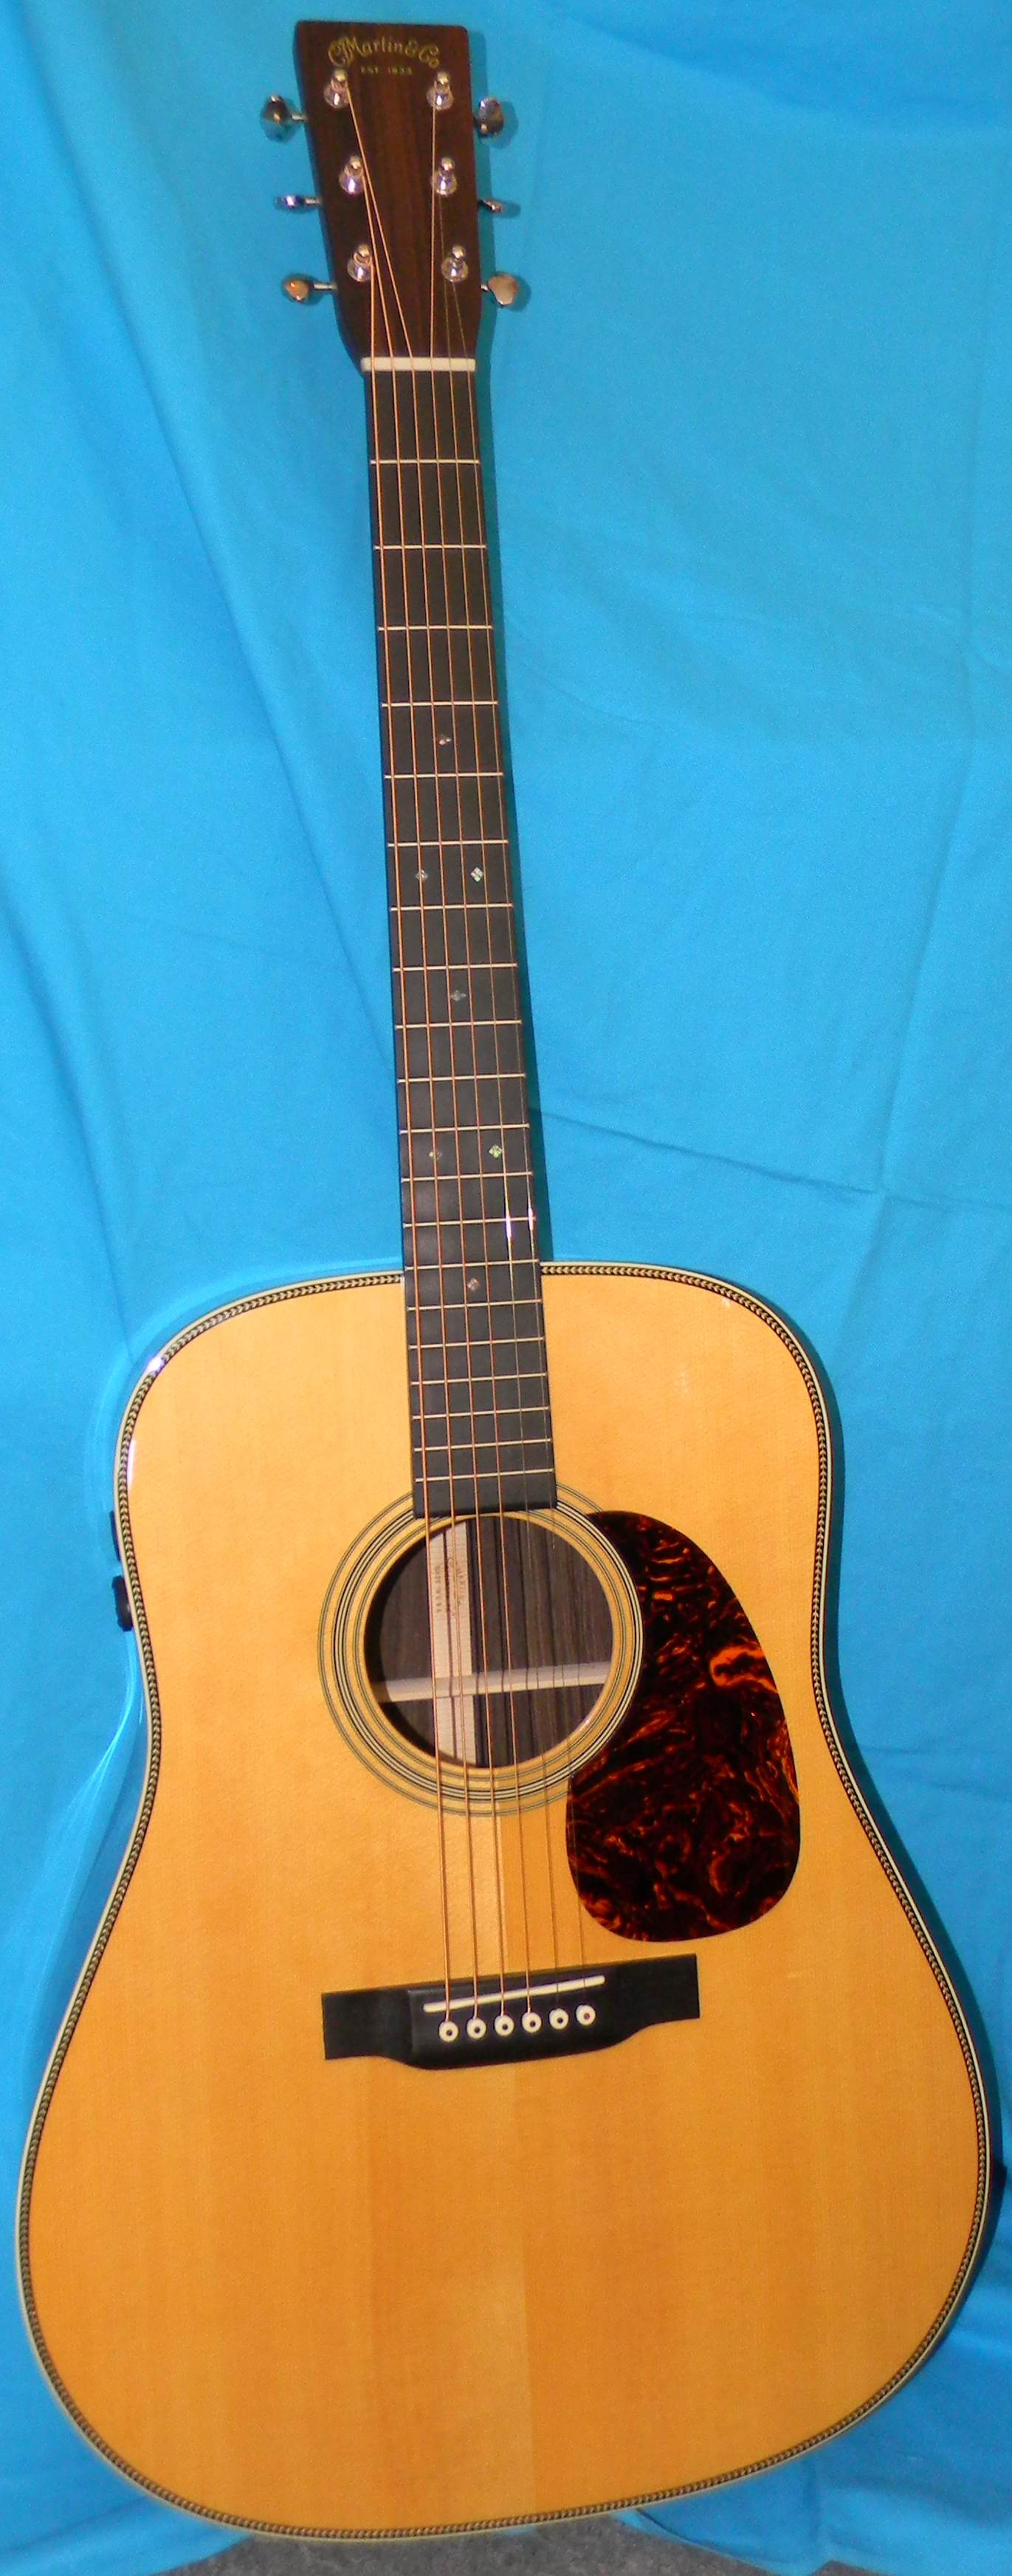 epidot hd28e retro 009 san antonio guitar store guitar tex. Black Bedroom Furniture Sets. Home Design Ideas